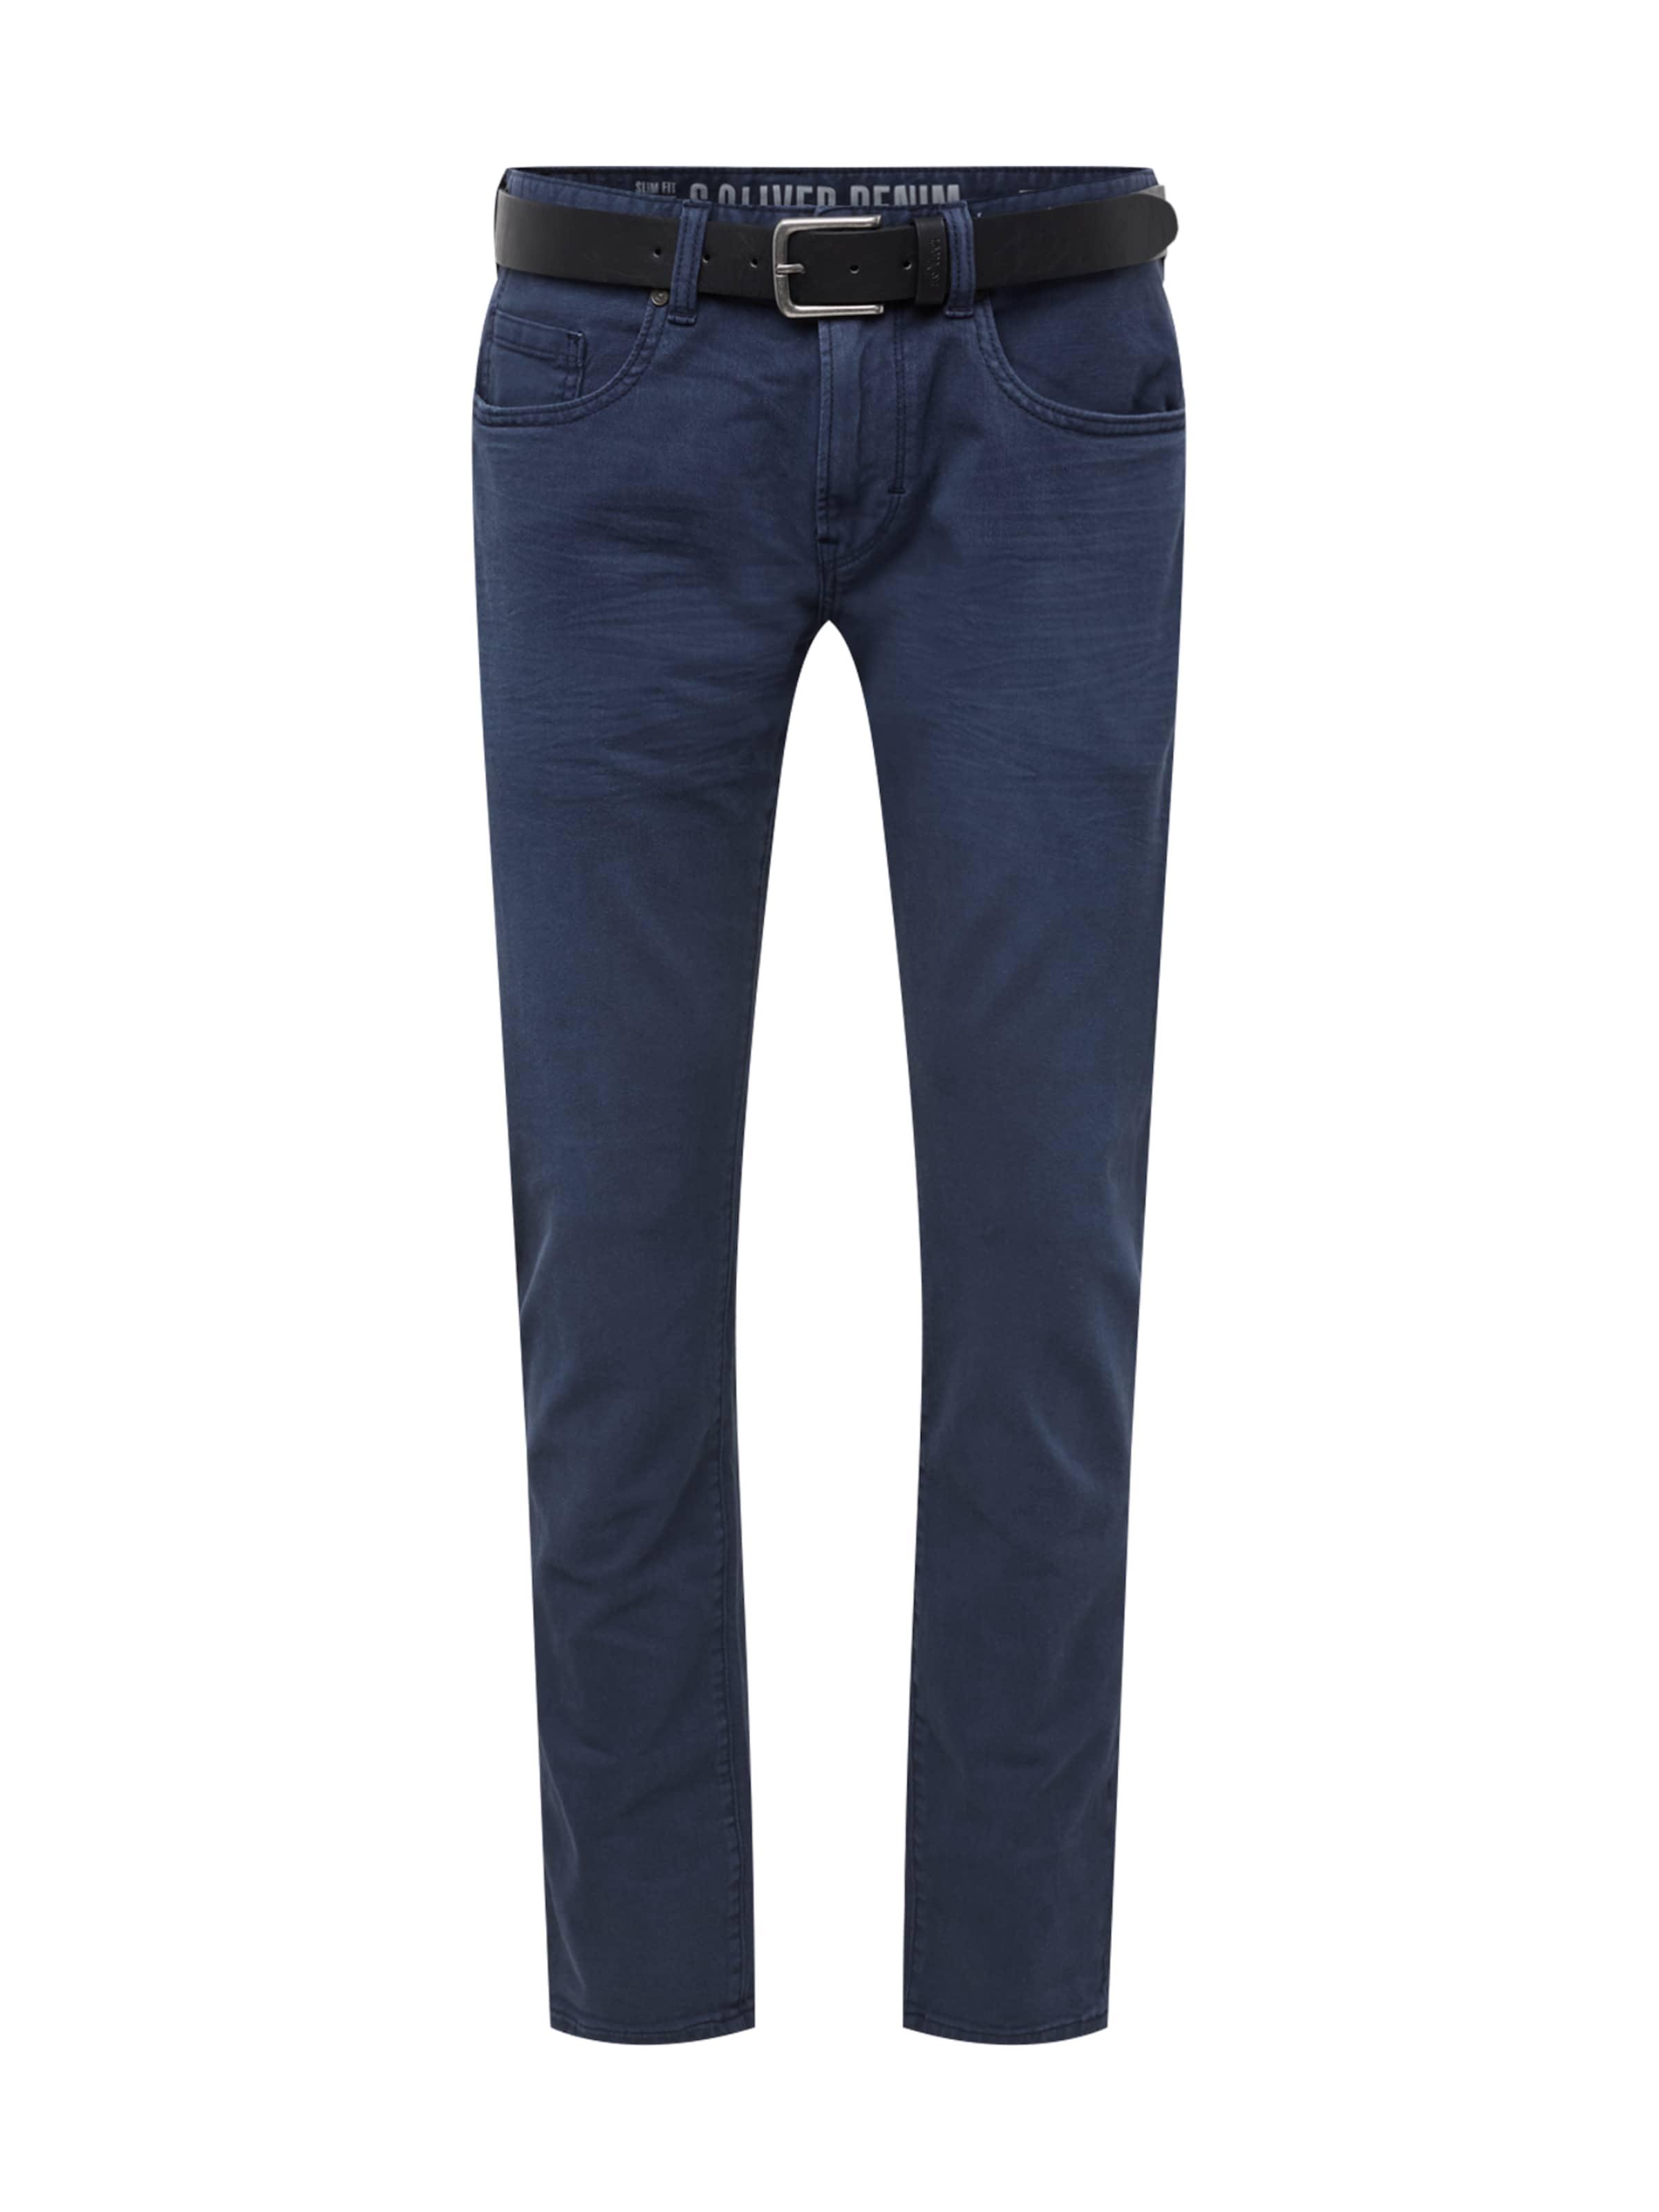 oliver Jean S Label Bleu Denim En 'pants Slim' Red F3KJluTc1